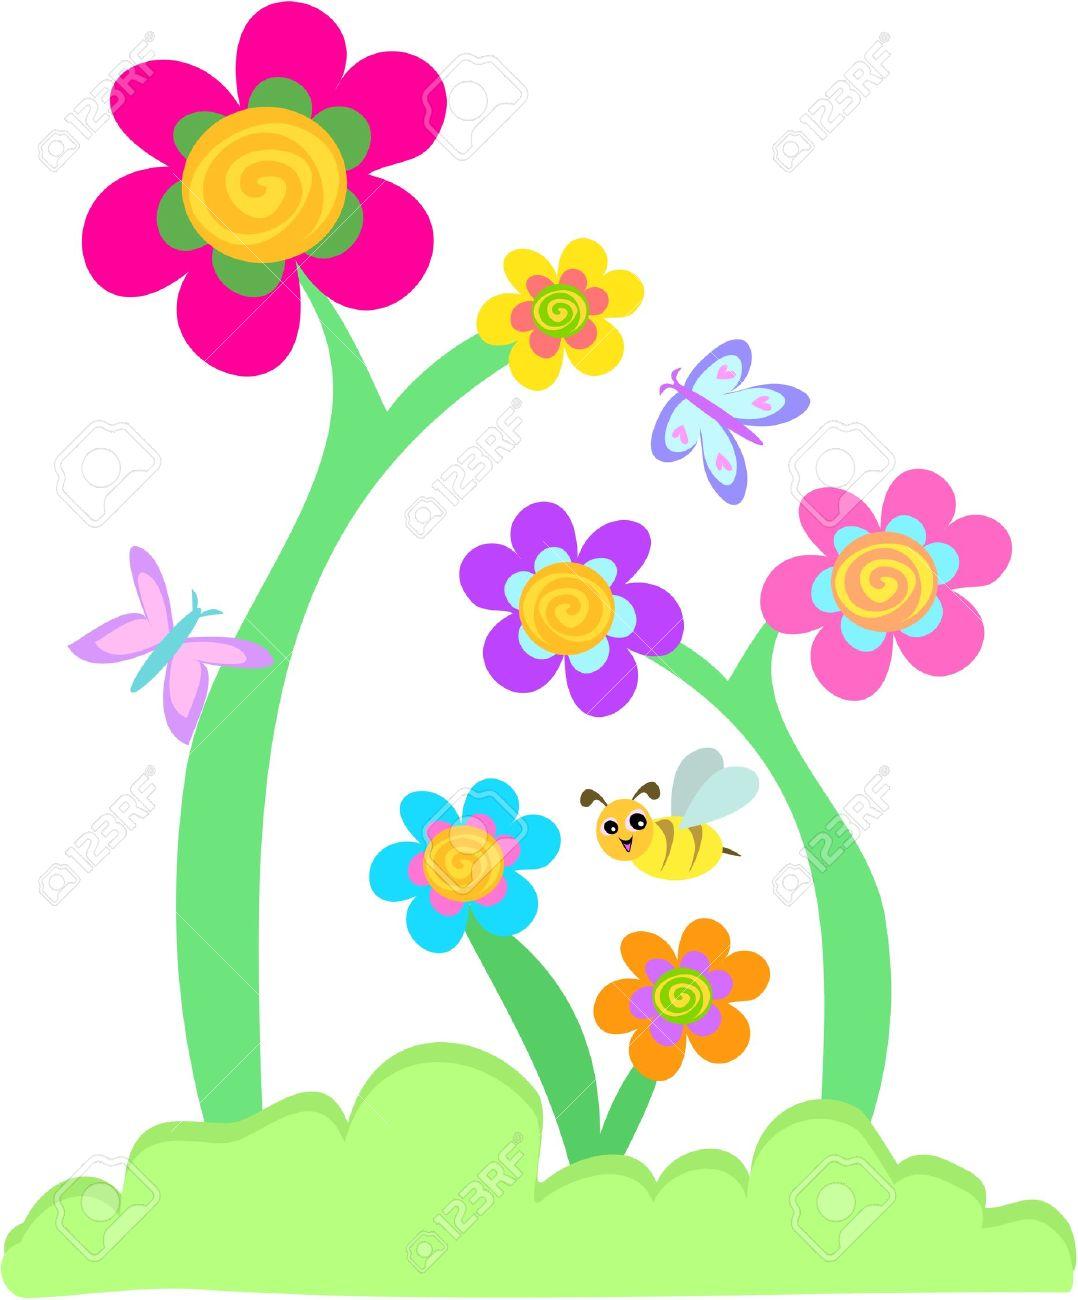 Cartoon Flower Pictures Free Download Best Cartoon Flower Pictures